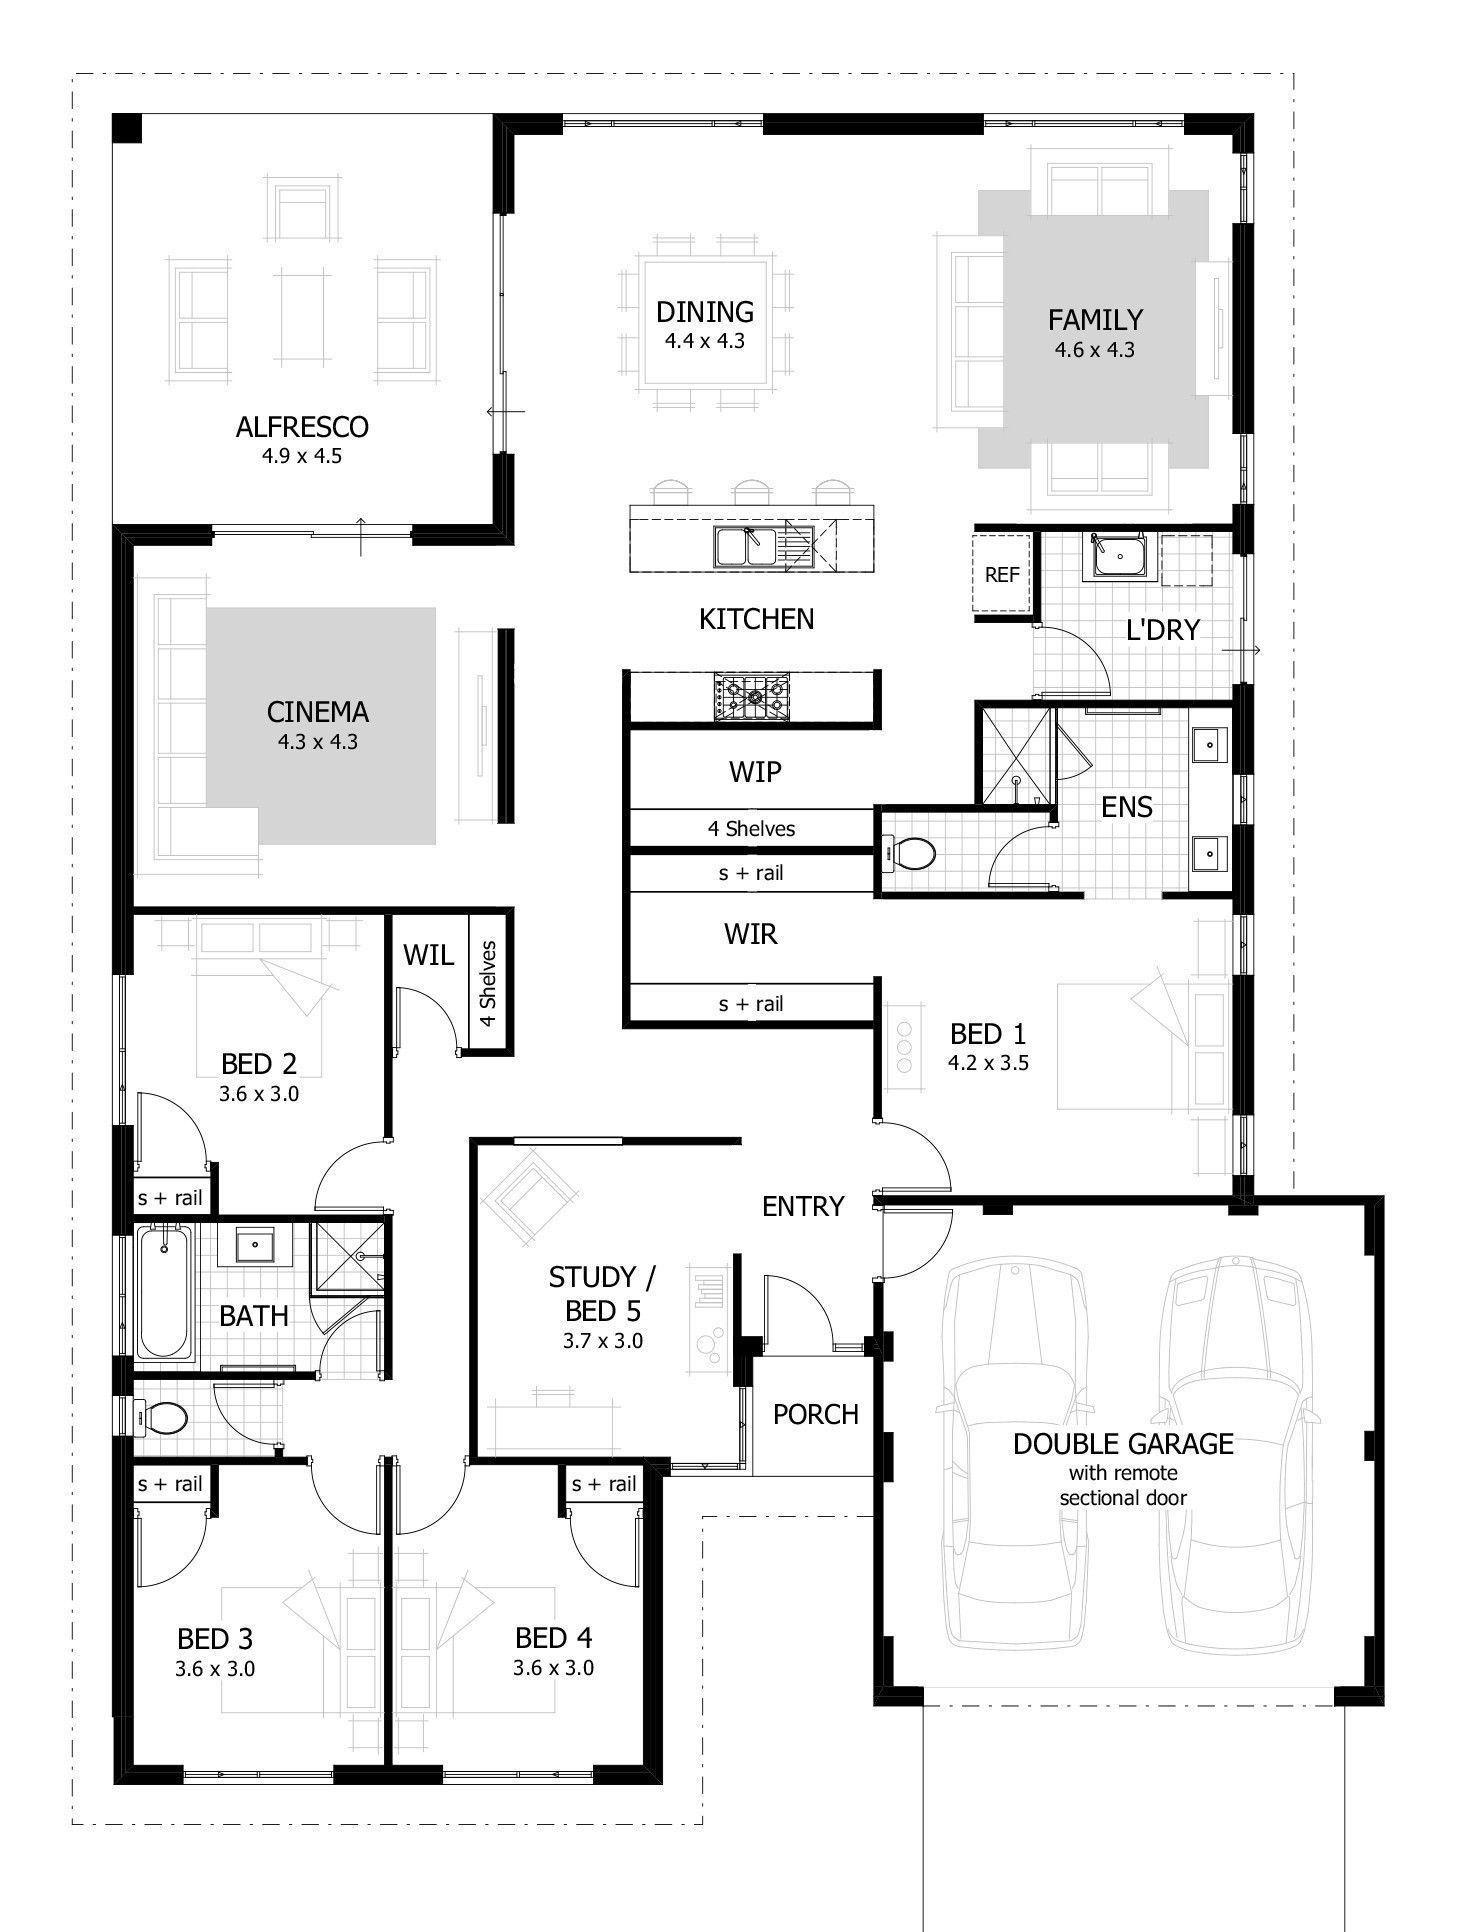 House Floor Plans Software Free Download 2021 Denah Desain Rumah Denah Rumah Desain Rumah